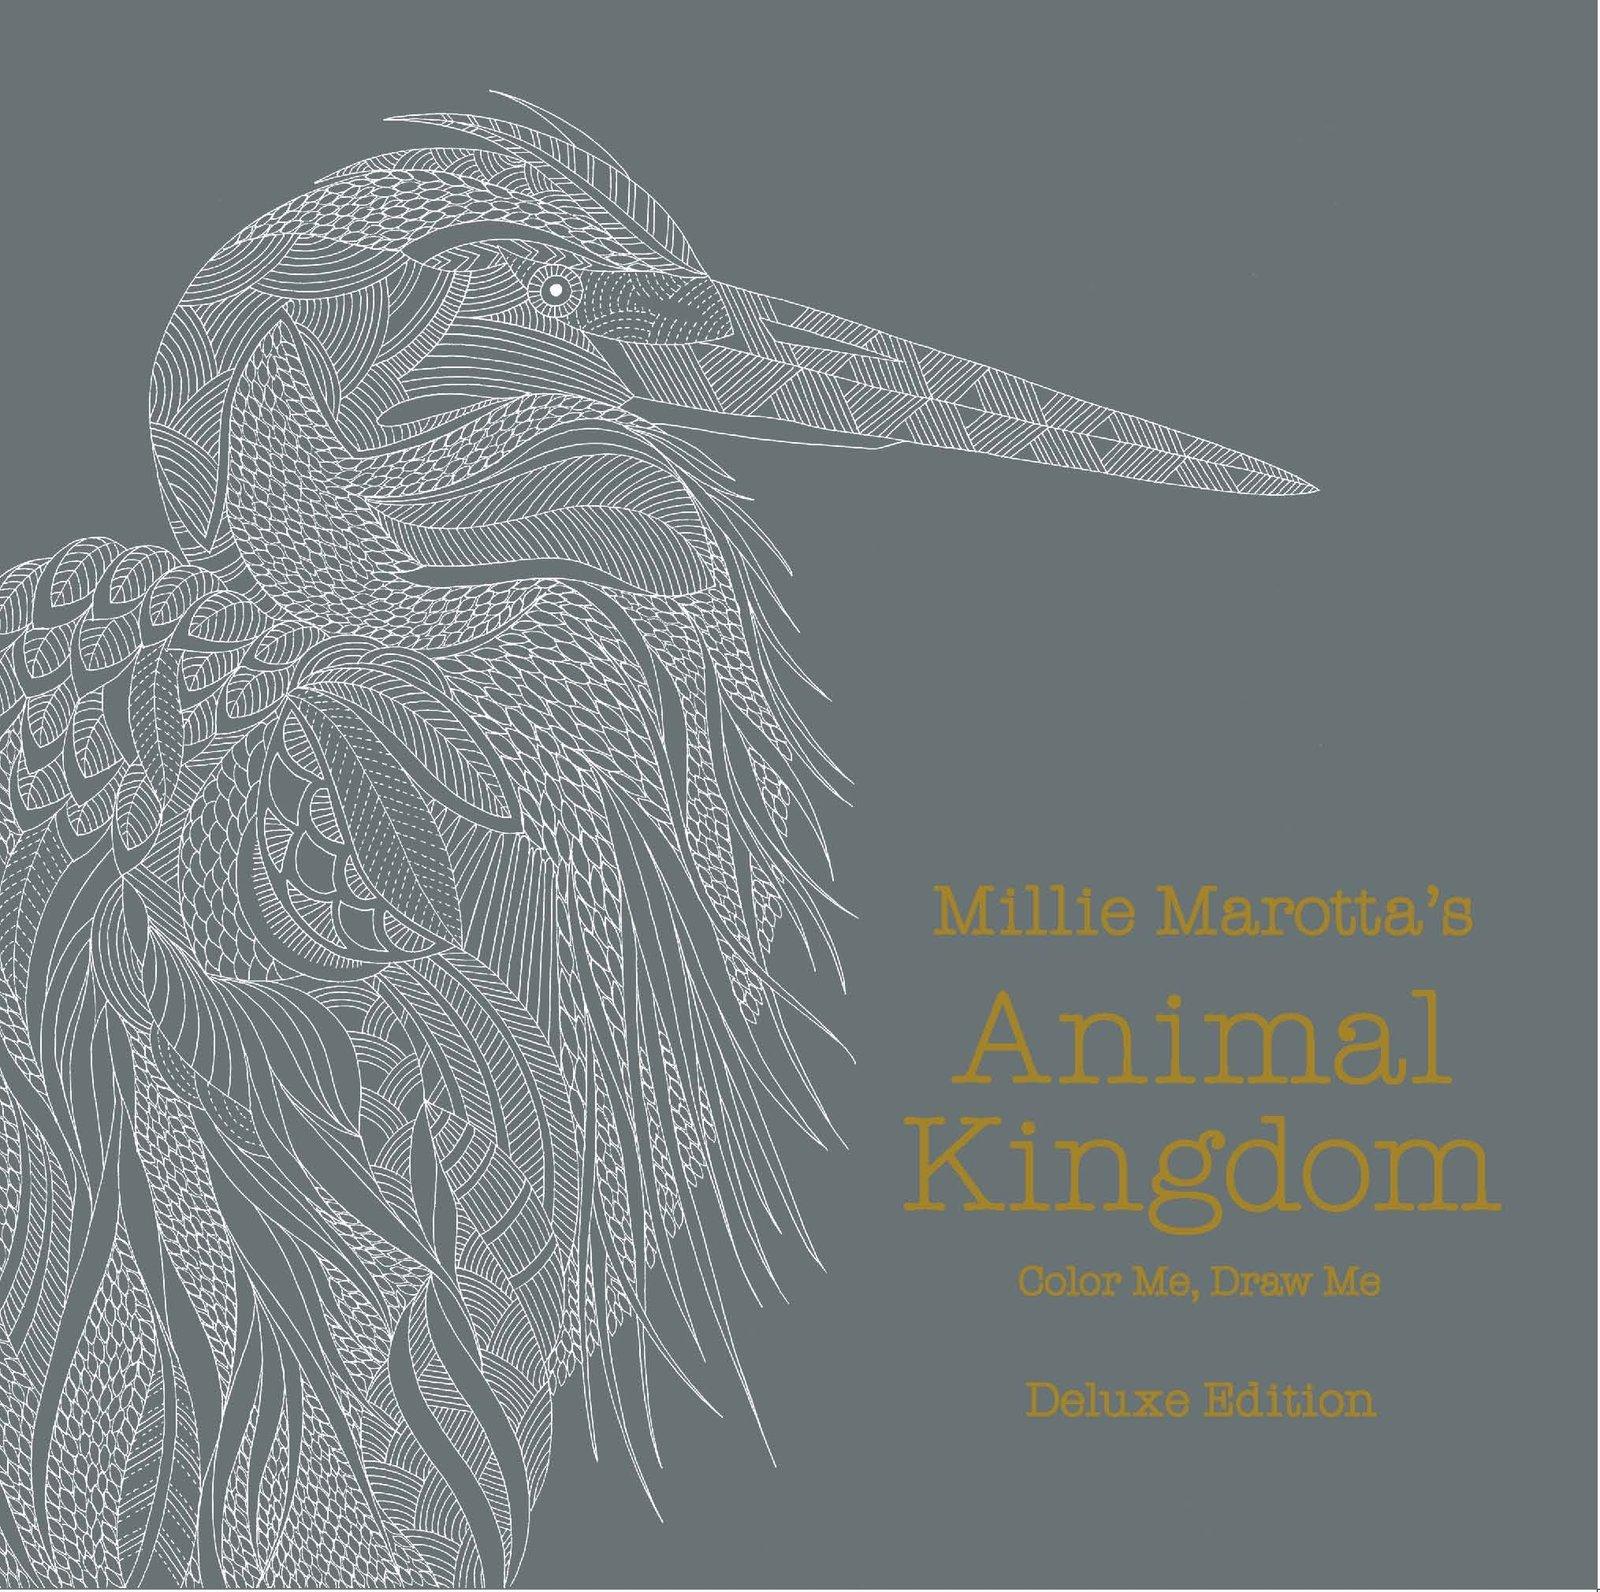 Animal kingdom coloring book deluxe edition : Millie marotta s animal kingdom linen bound deluxe edition